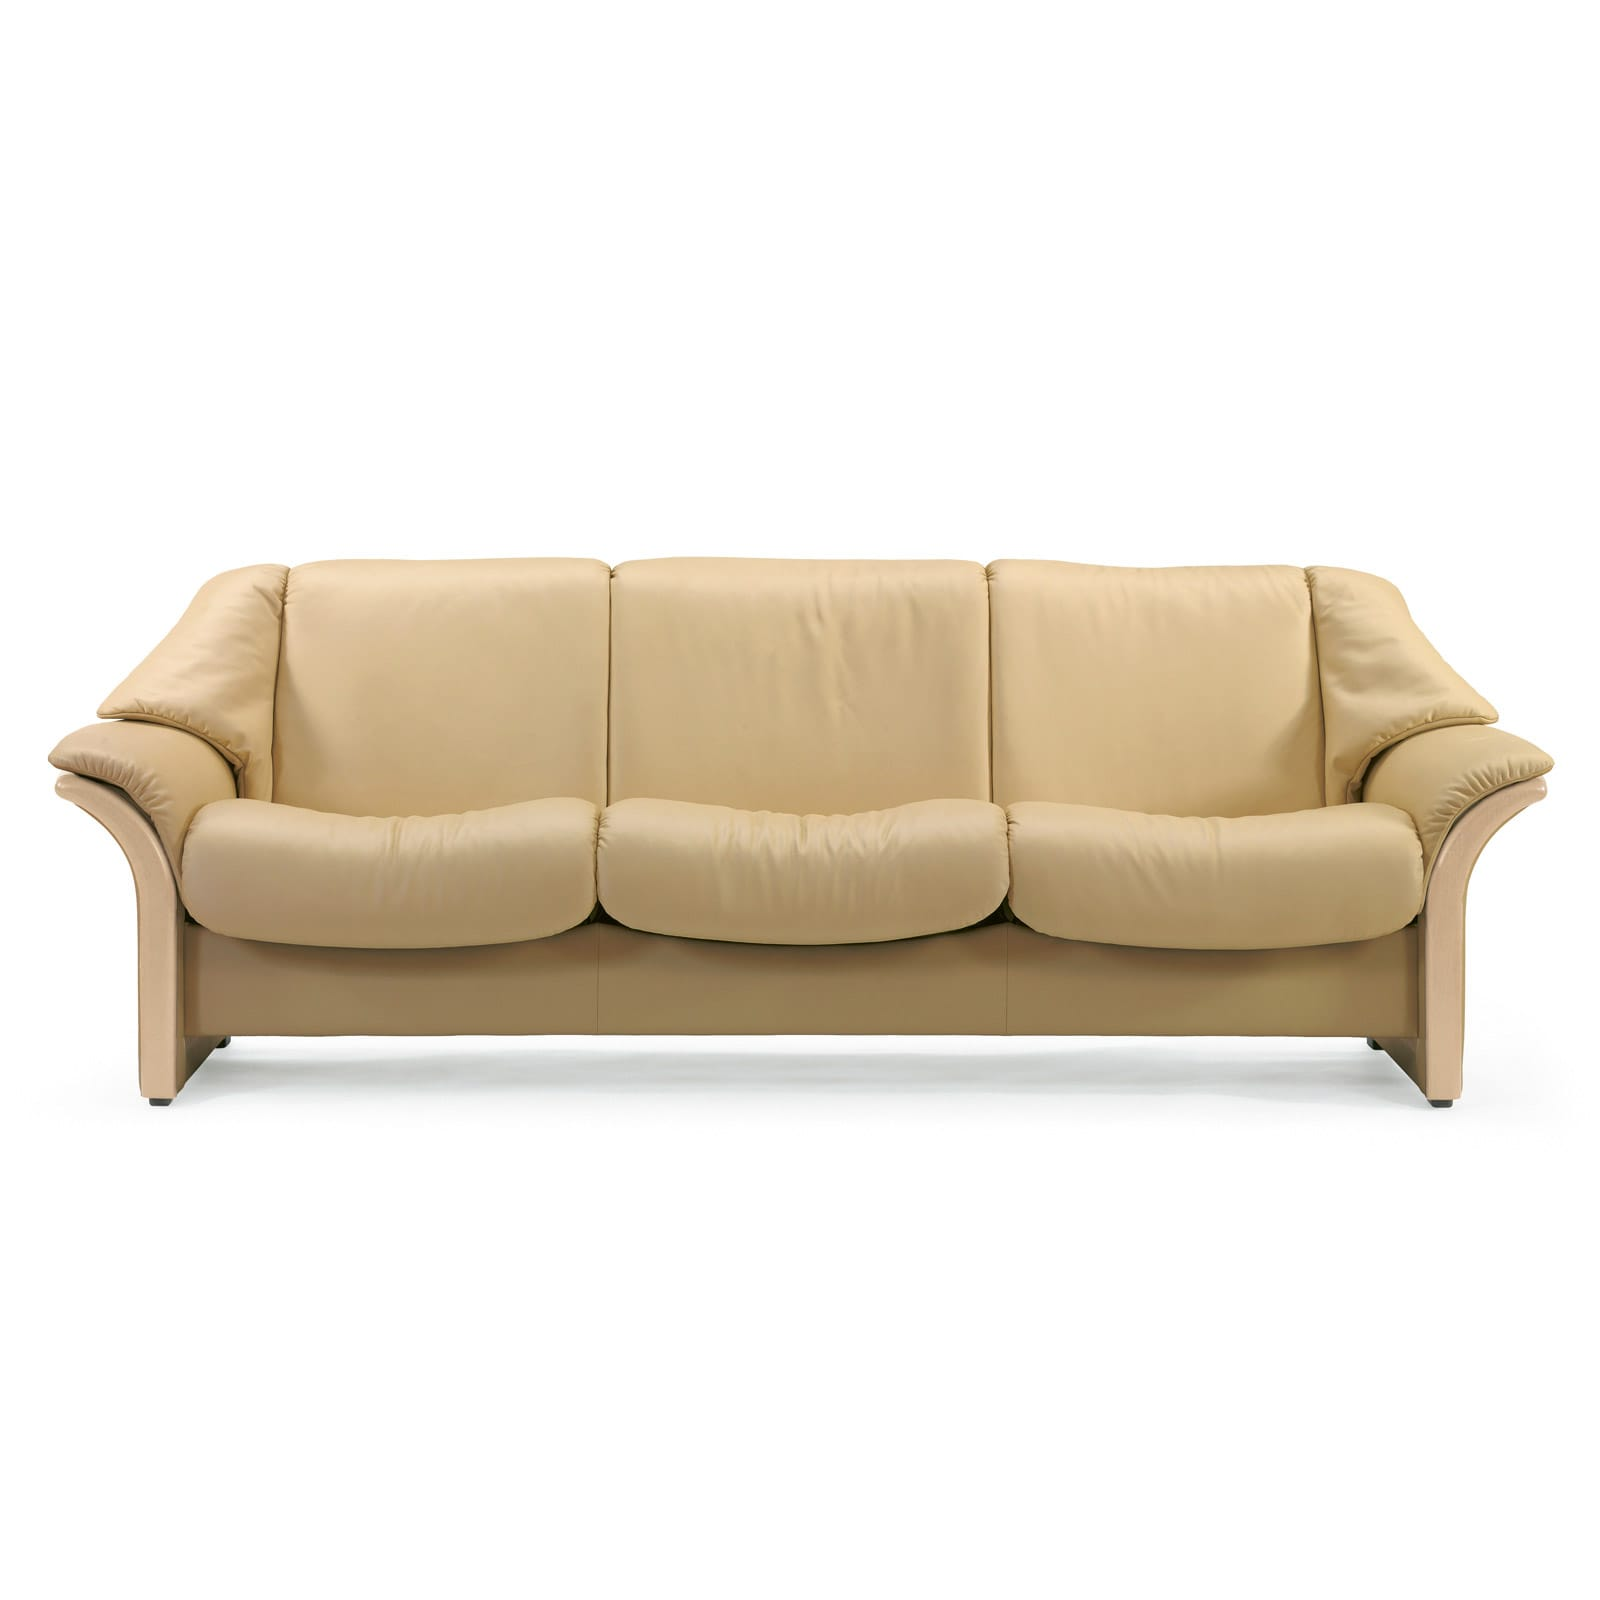 stressless sofa 3 sitzer eldorado m niedrig sand natur. Black Bedroom Furniture Sets. Home Design Ideas